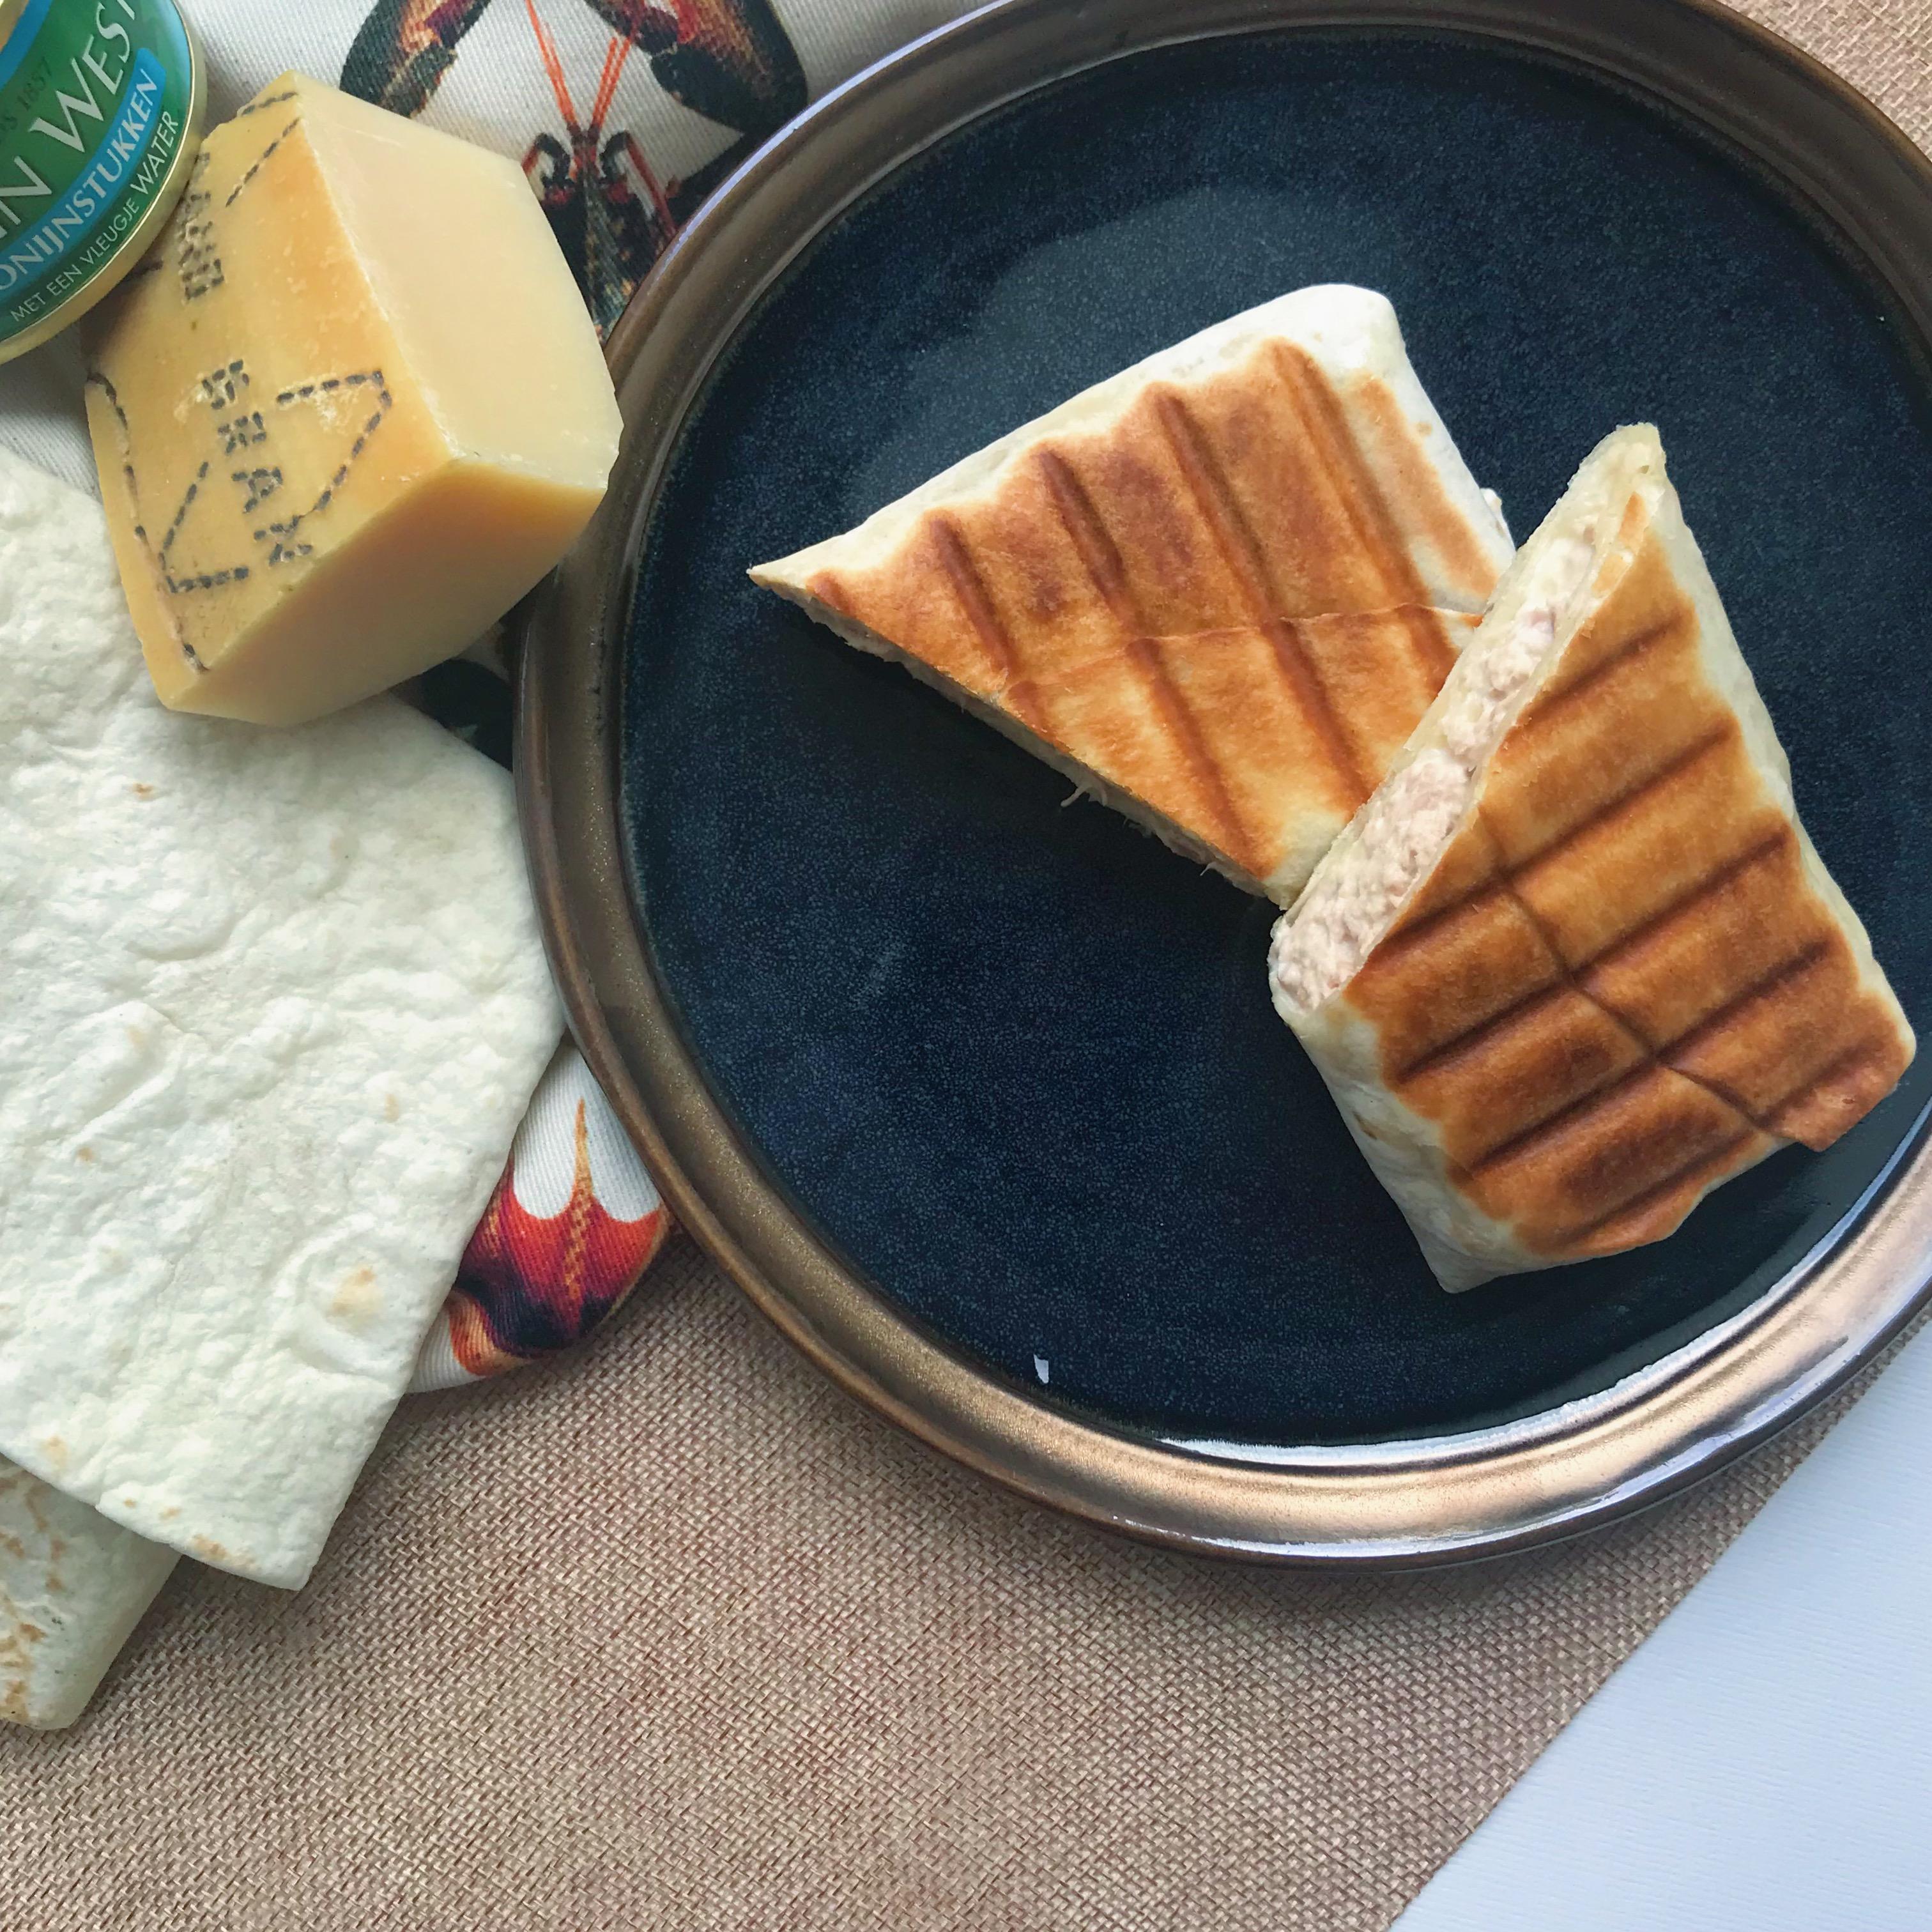 Foodblogswap April: Tuna melt wrap